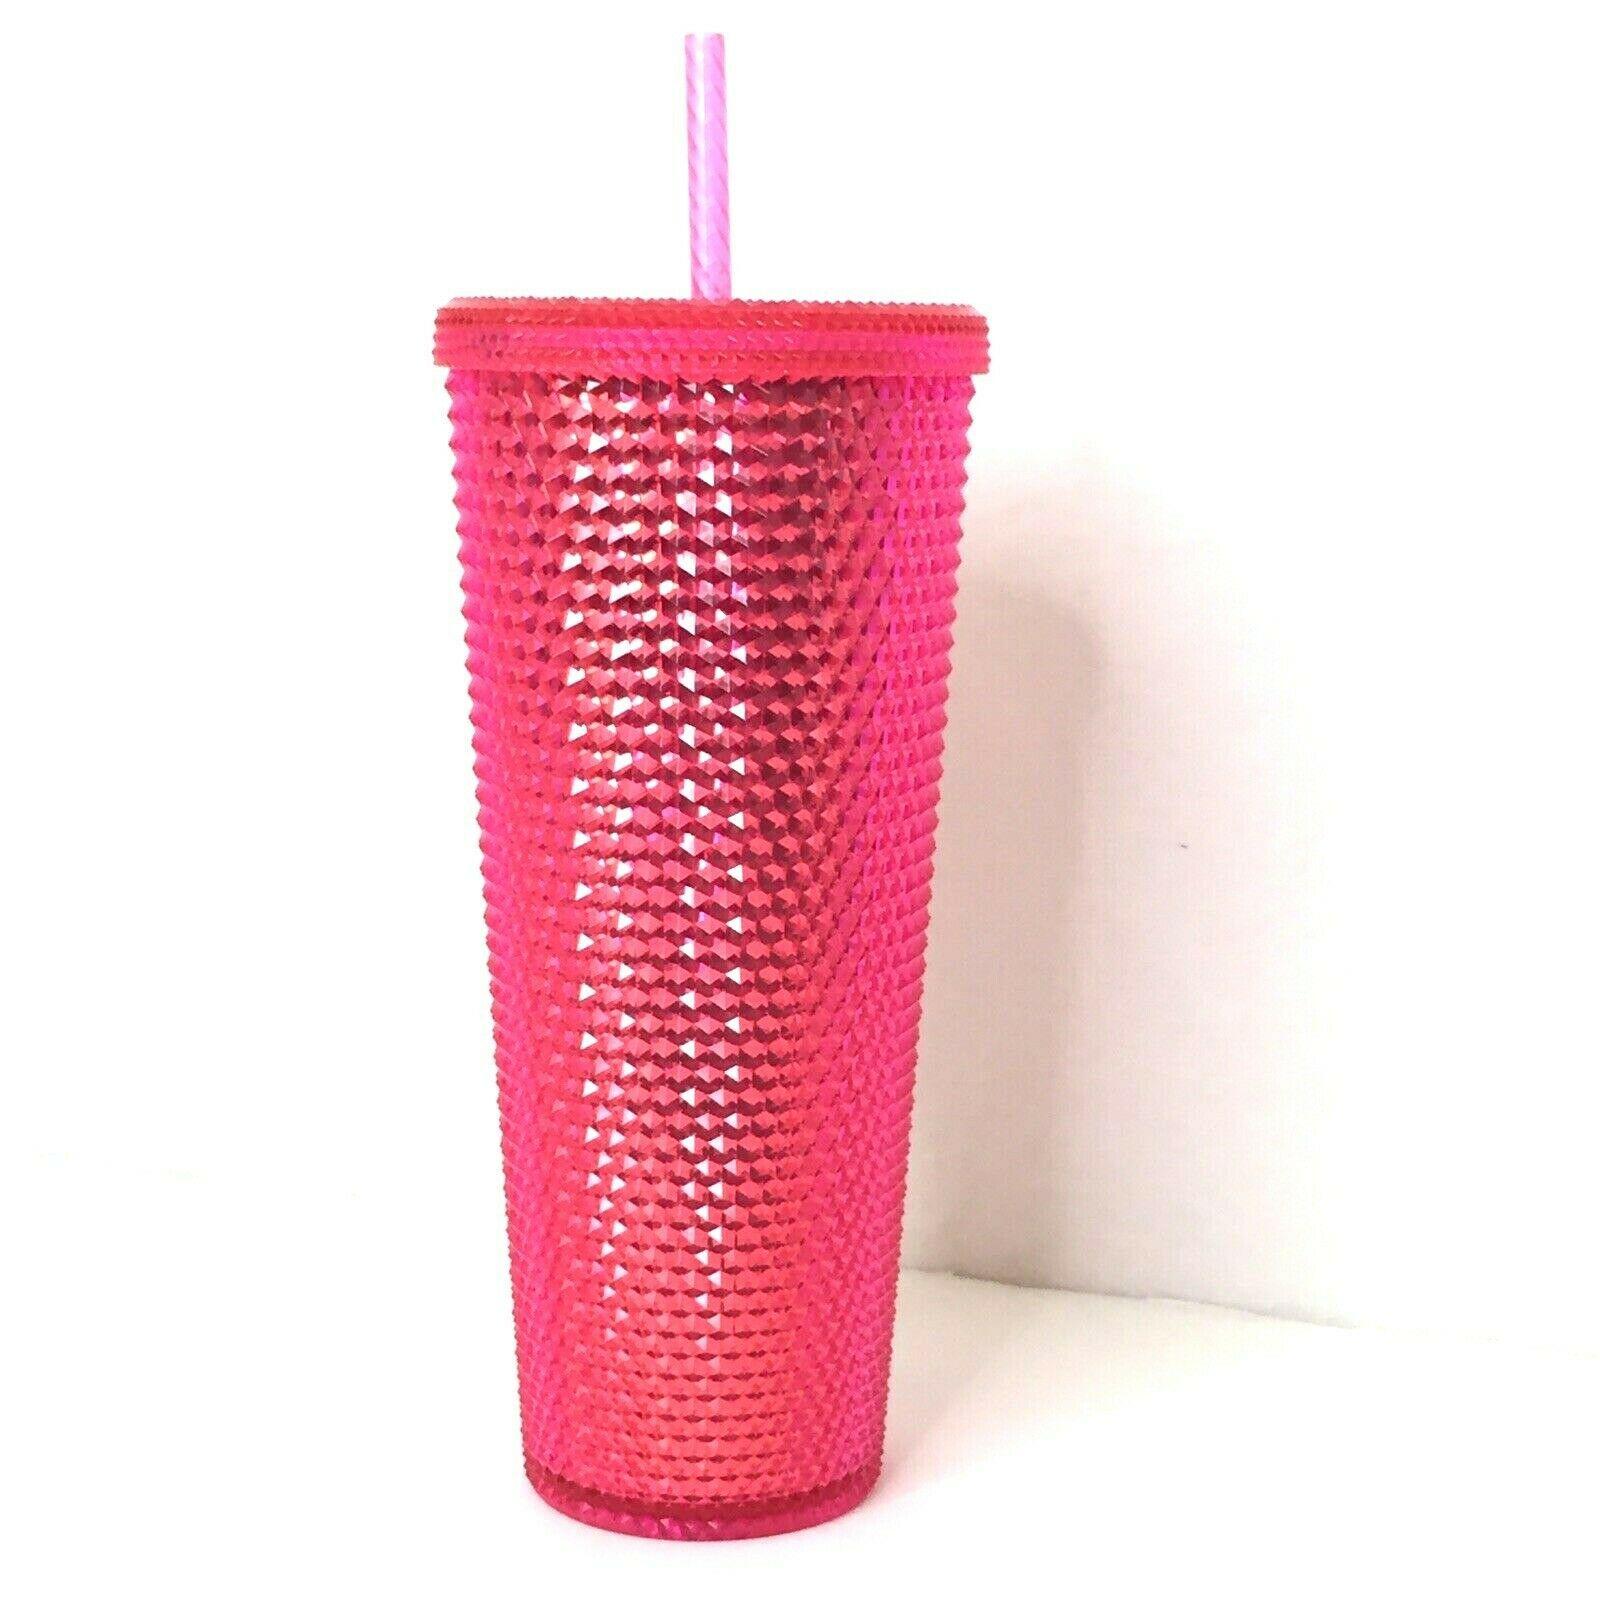 Starbucks 2019 Holiday Pink Red Studded Tumbler Christmas 24 oz Lid & Straw NEW image 2